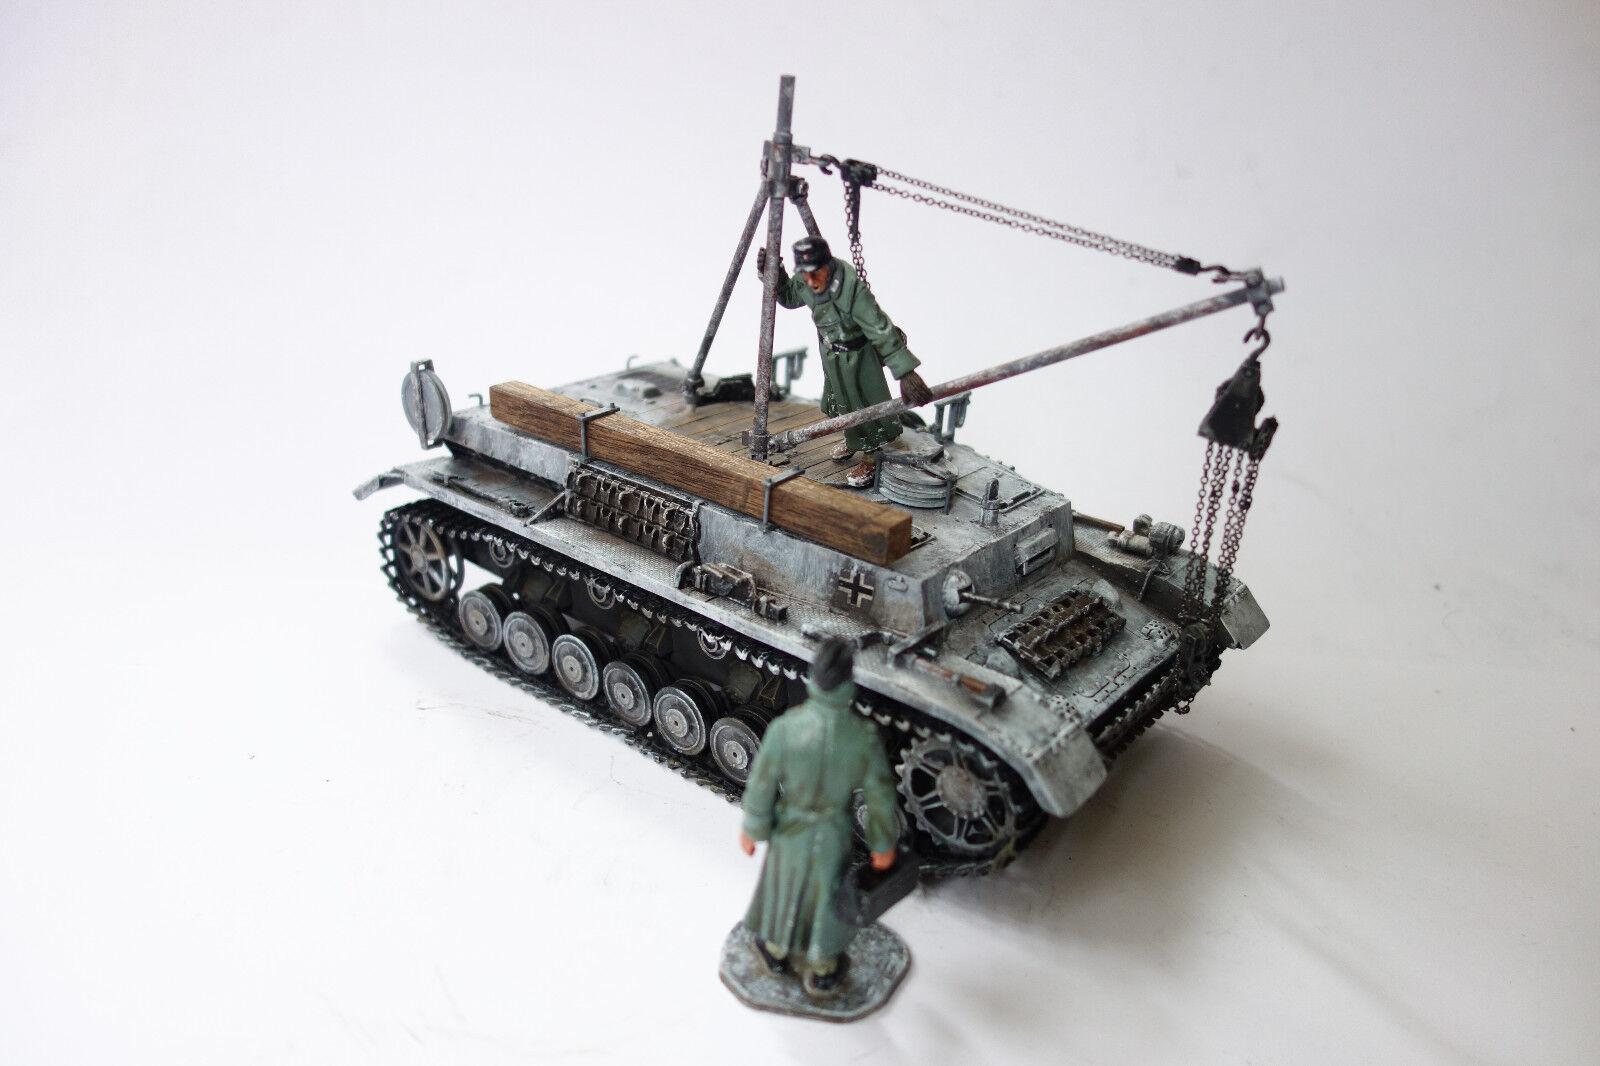 Figarti Miniatures Miniatures Miniatures German Bergepanzer IV  1 30 ETG-008 Limited Edition 4359e5